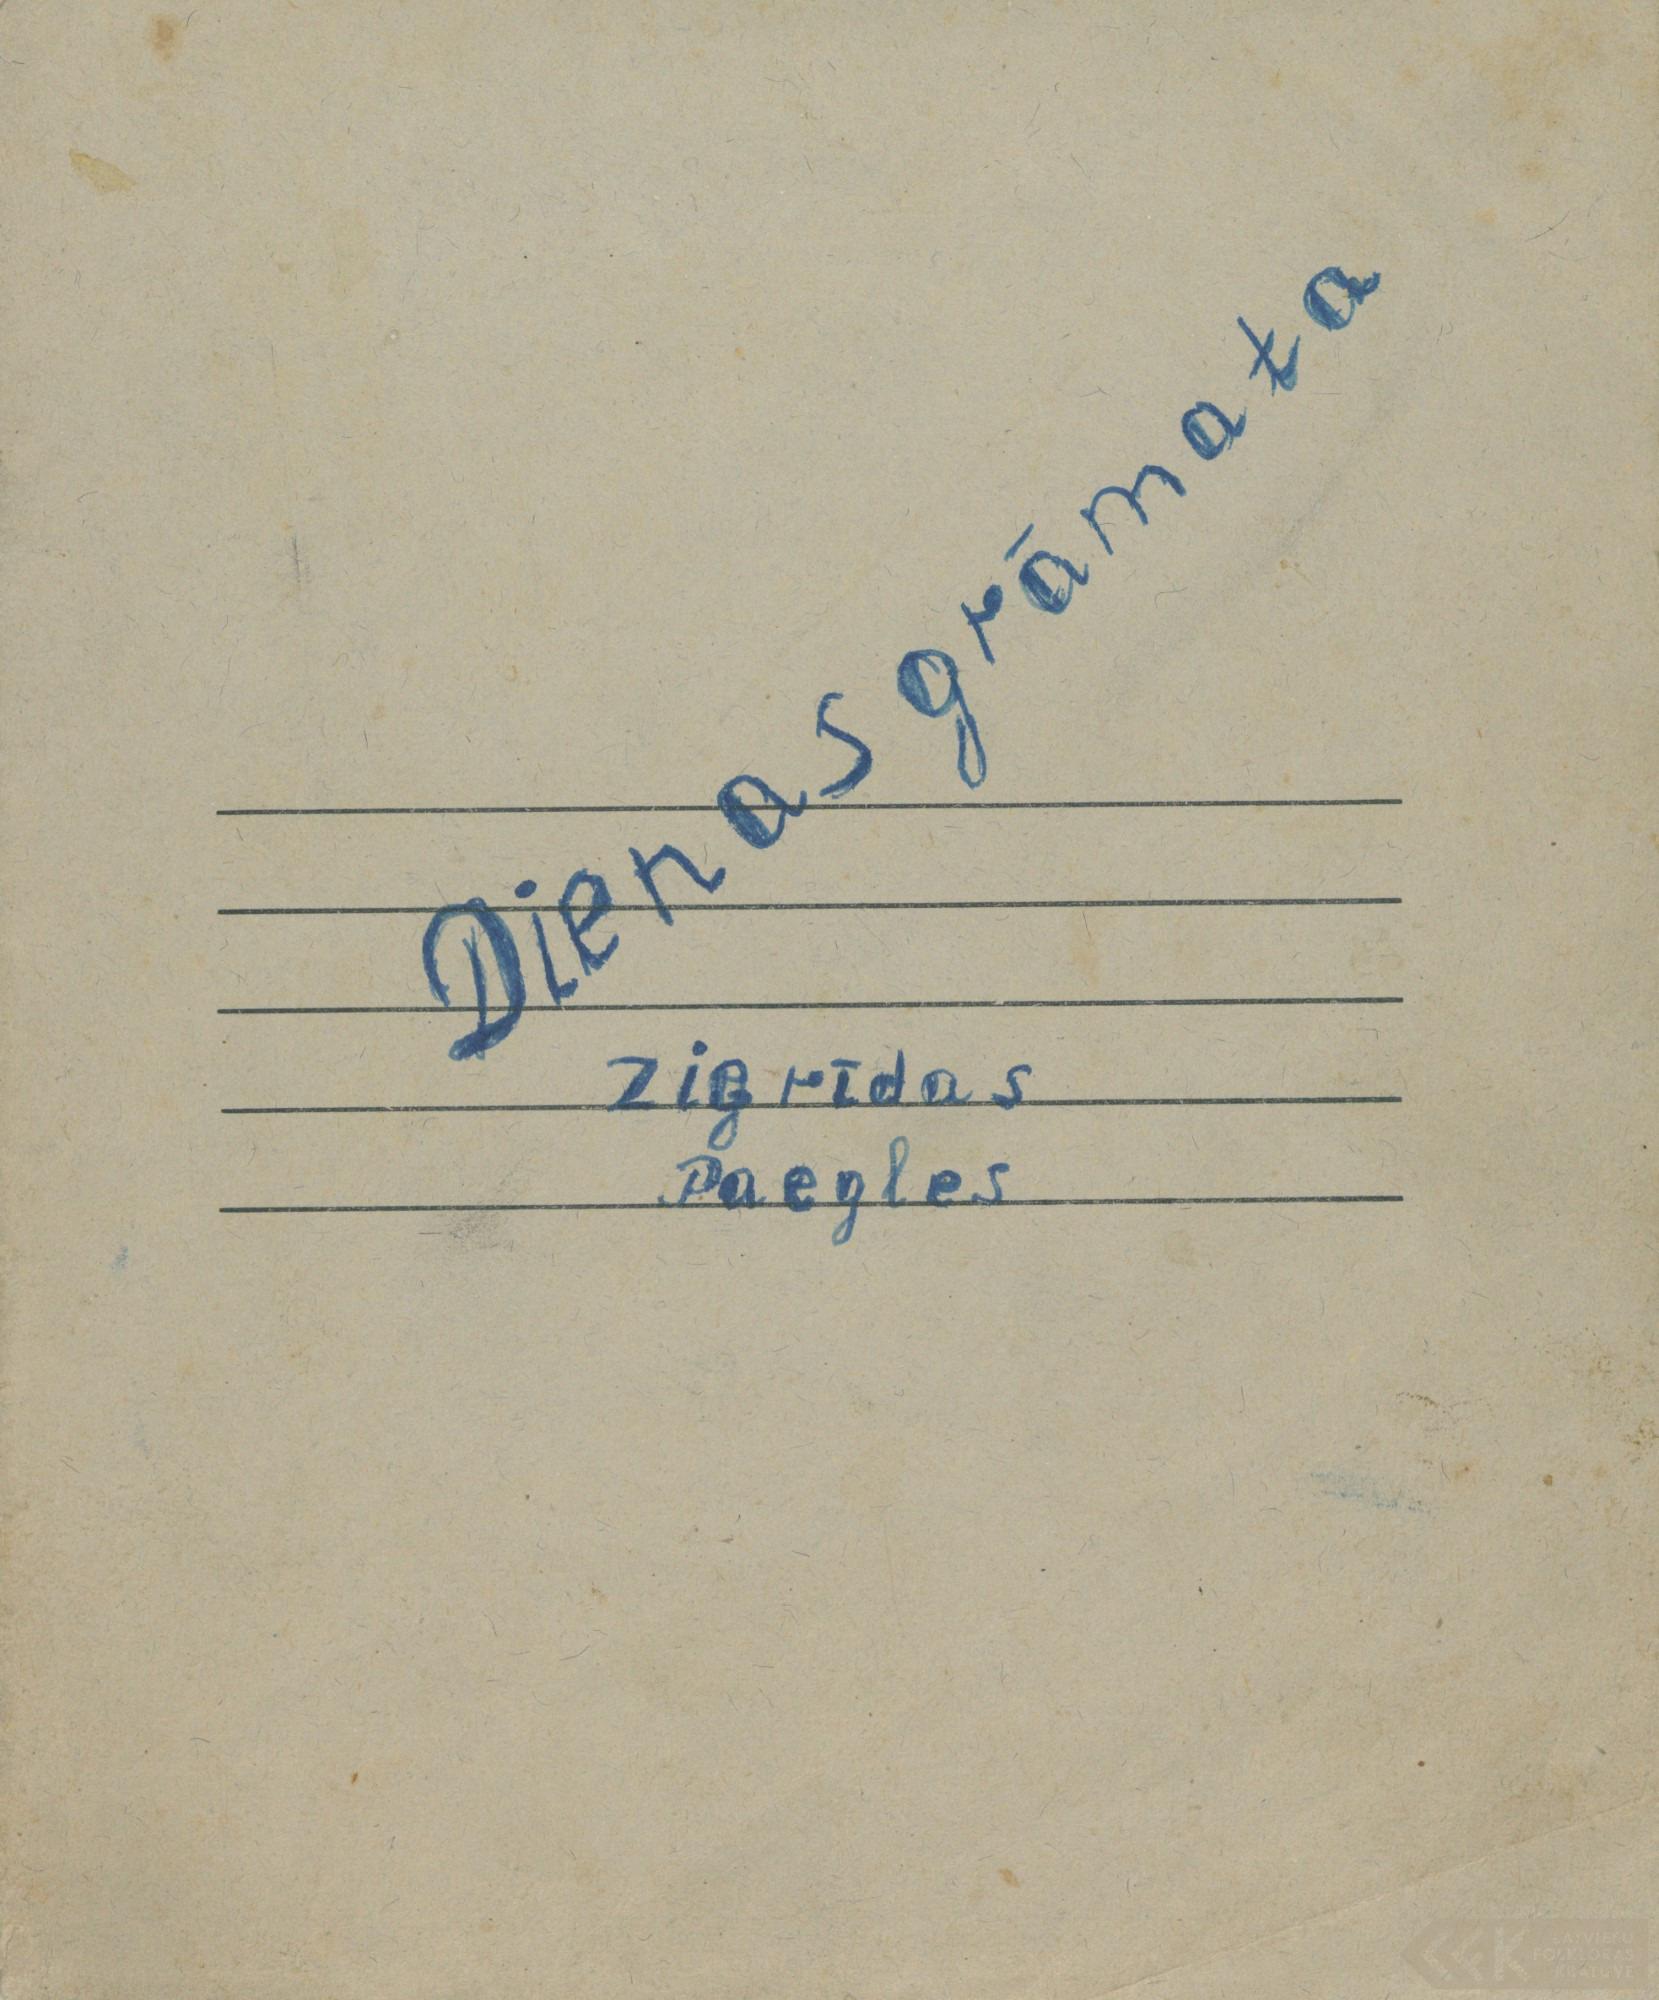 Ak139-Zigridas-Paegles-dienasgramatas-01-0001